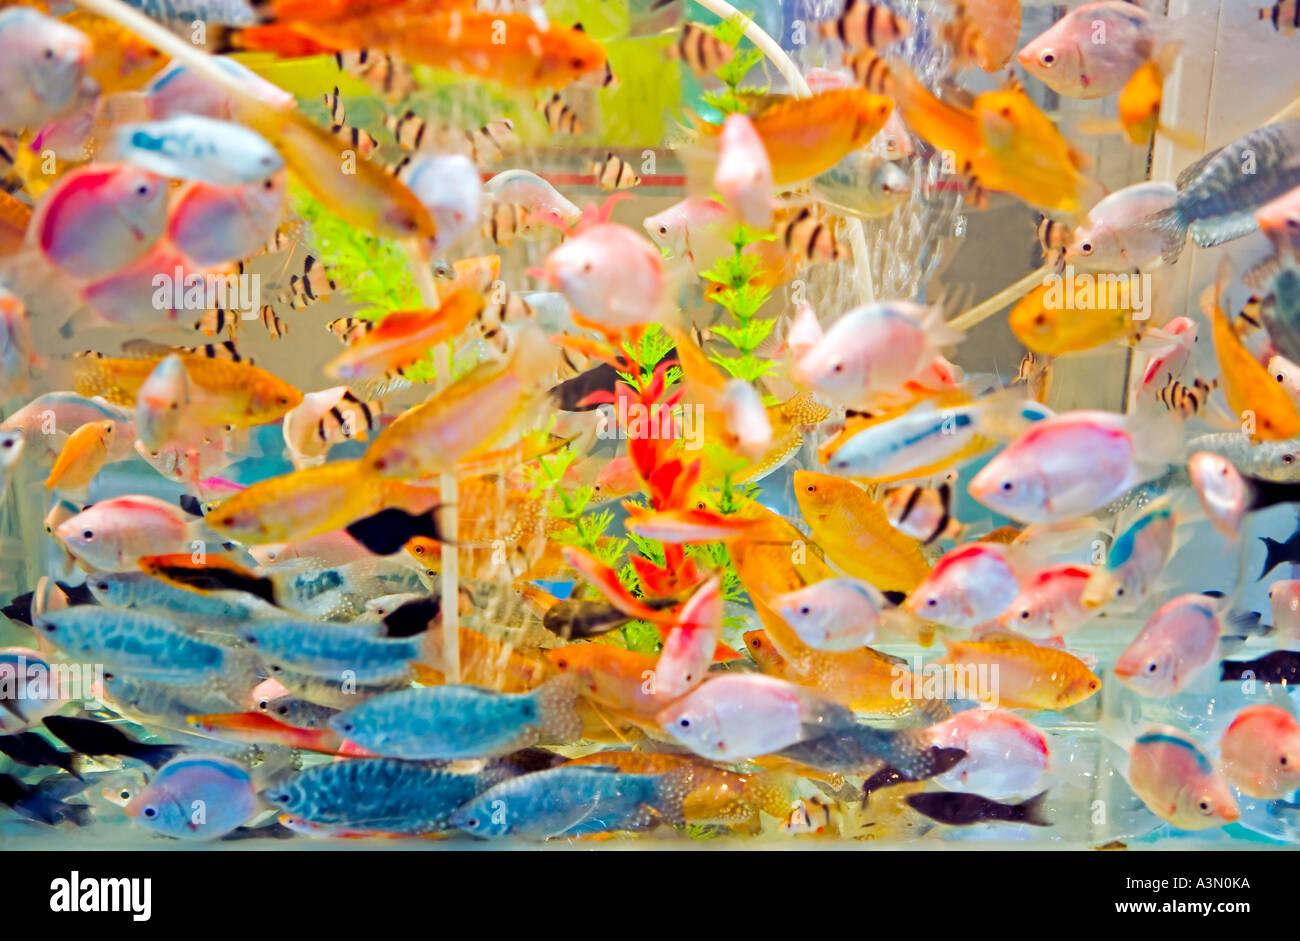 China Hangzhou Aquarium Full Of Brightly Colored Tropical